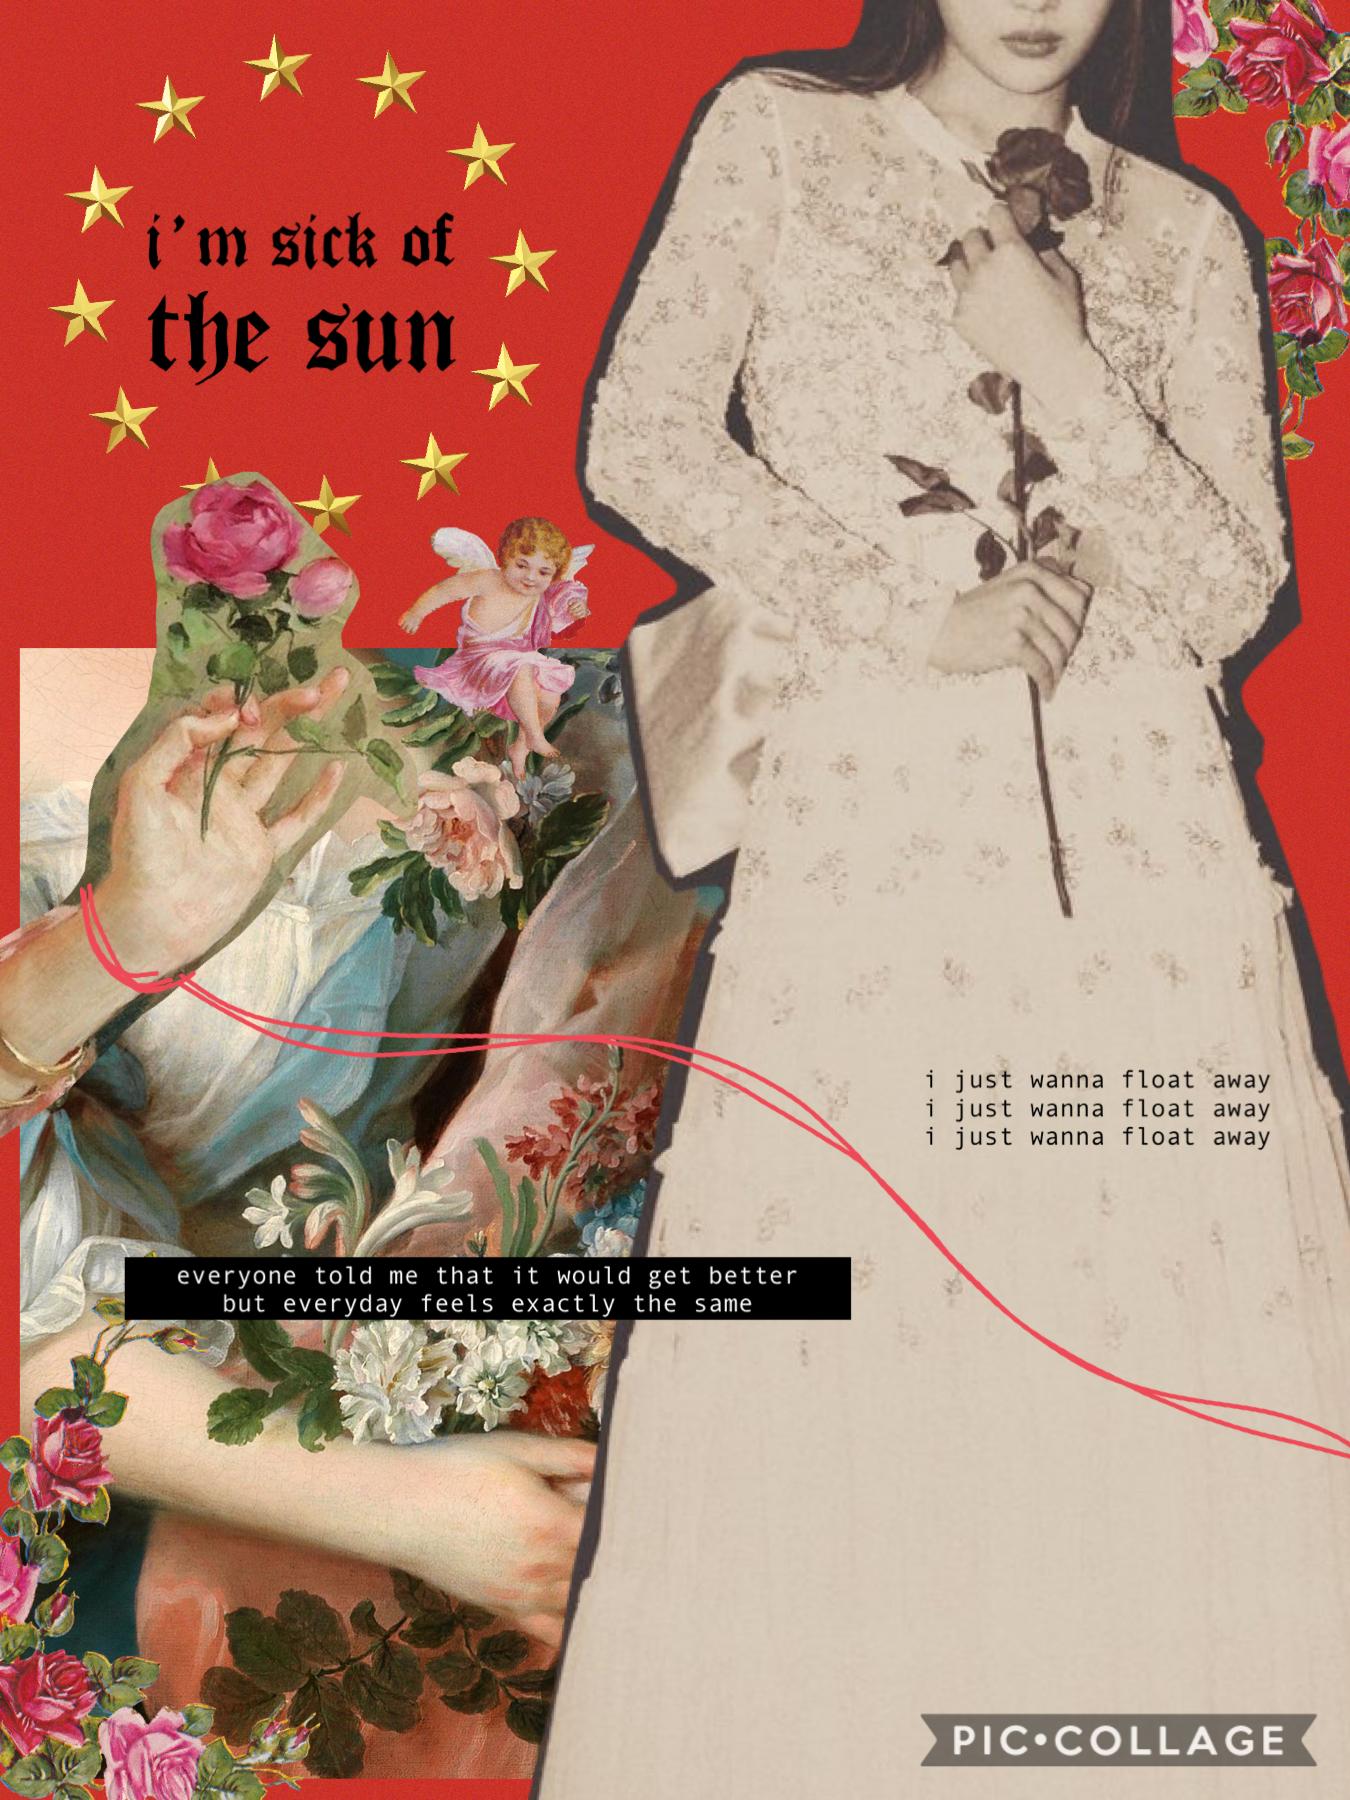 sick of the sun